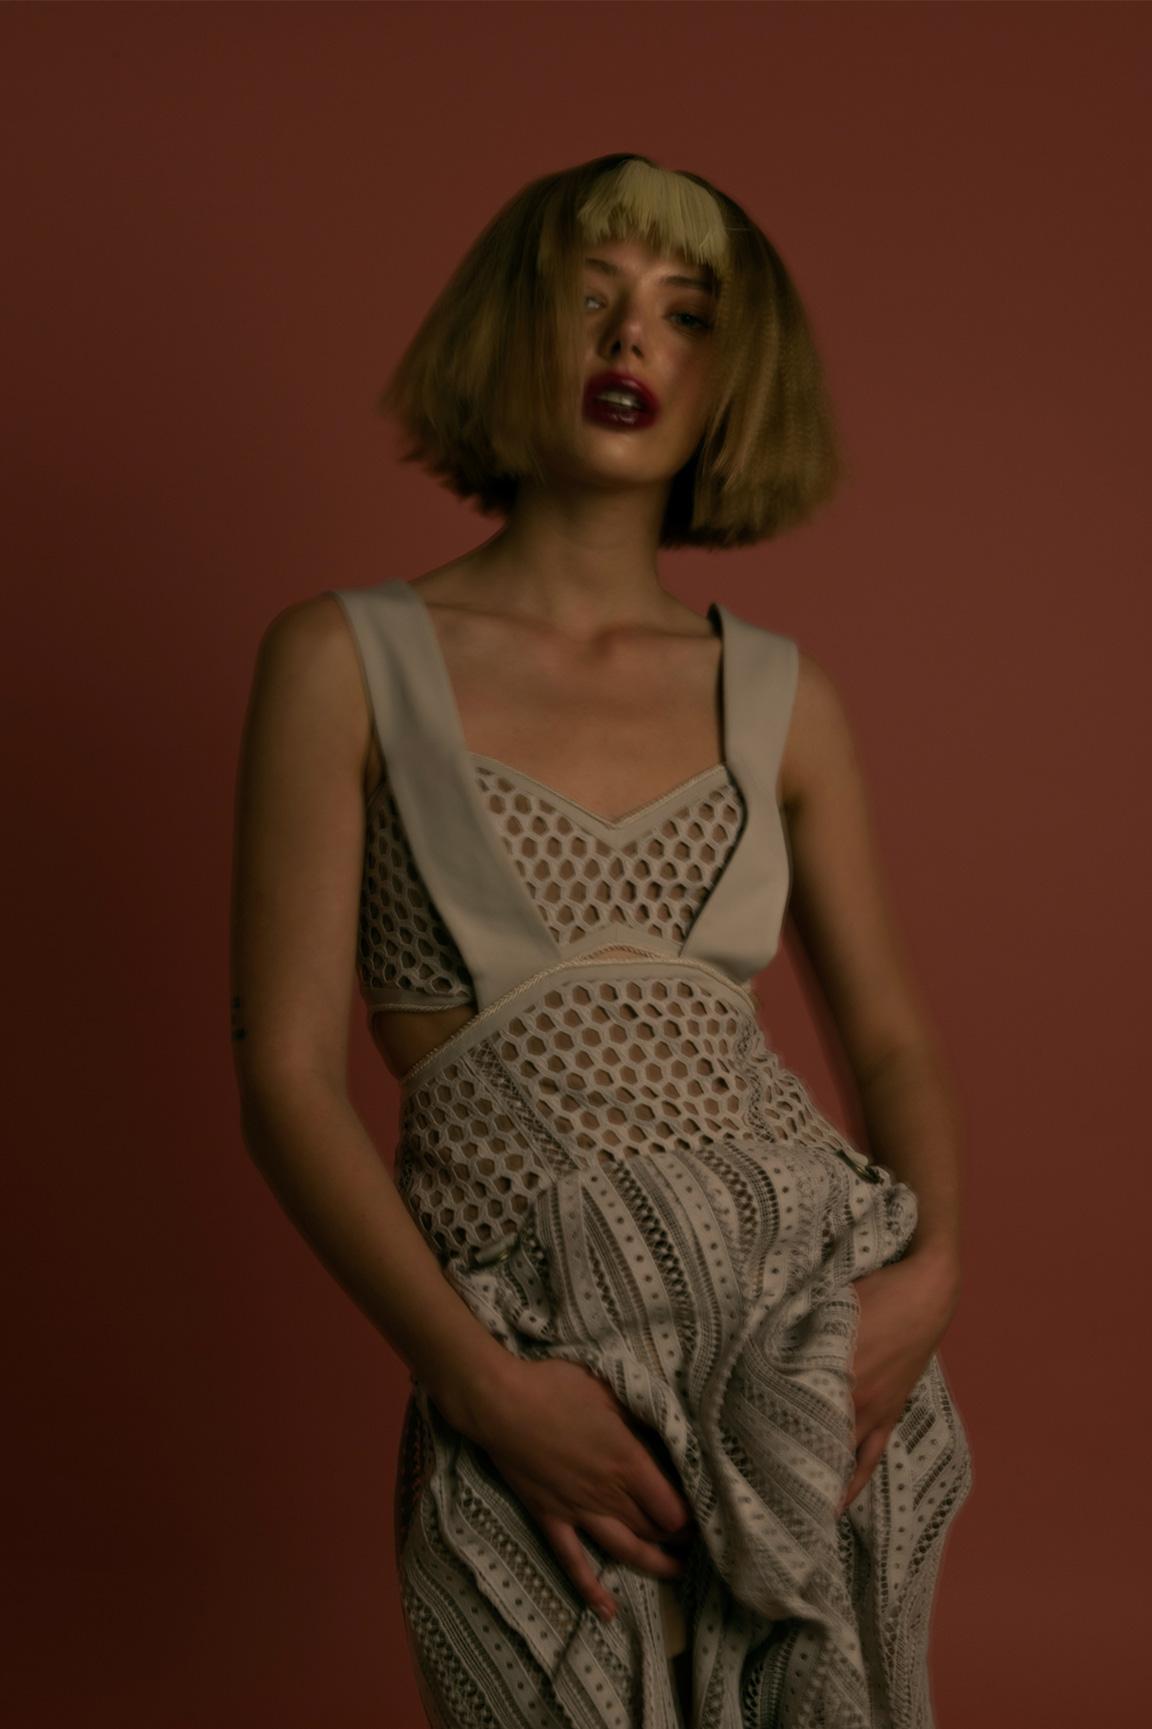 leam edit a doll s nostalgia editorial self portrait msgm valentino shirt jumpsuit